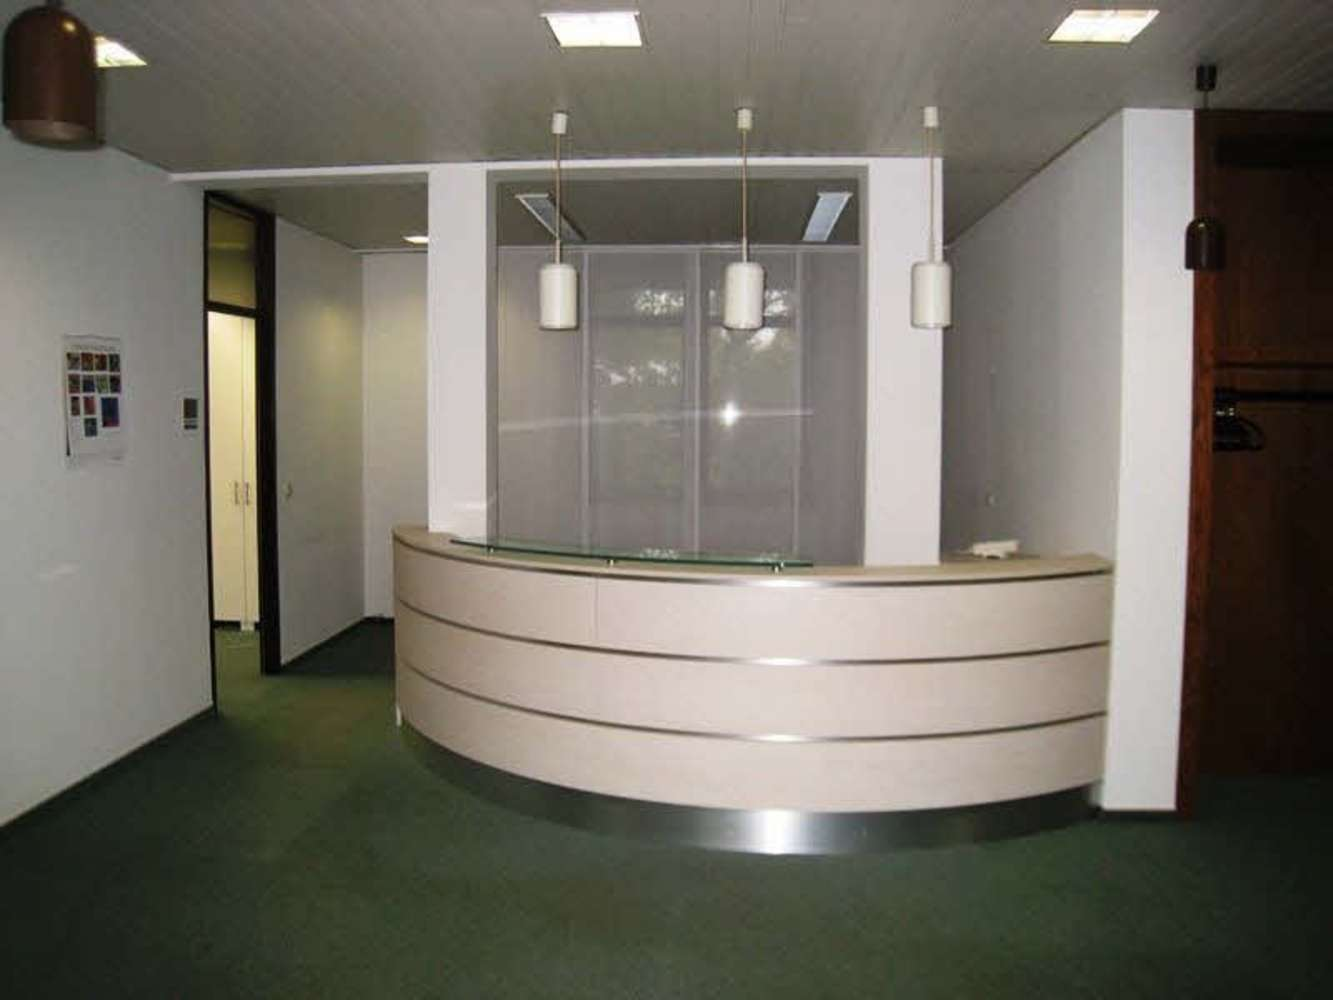 Büros Mönchengladbach, 41061 - Büro - Mönchengladbach, Stadtmitte - D2209 - 9504615